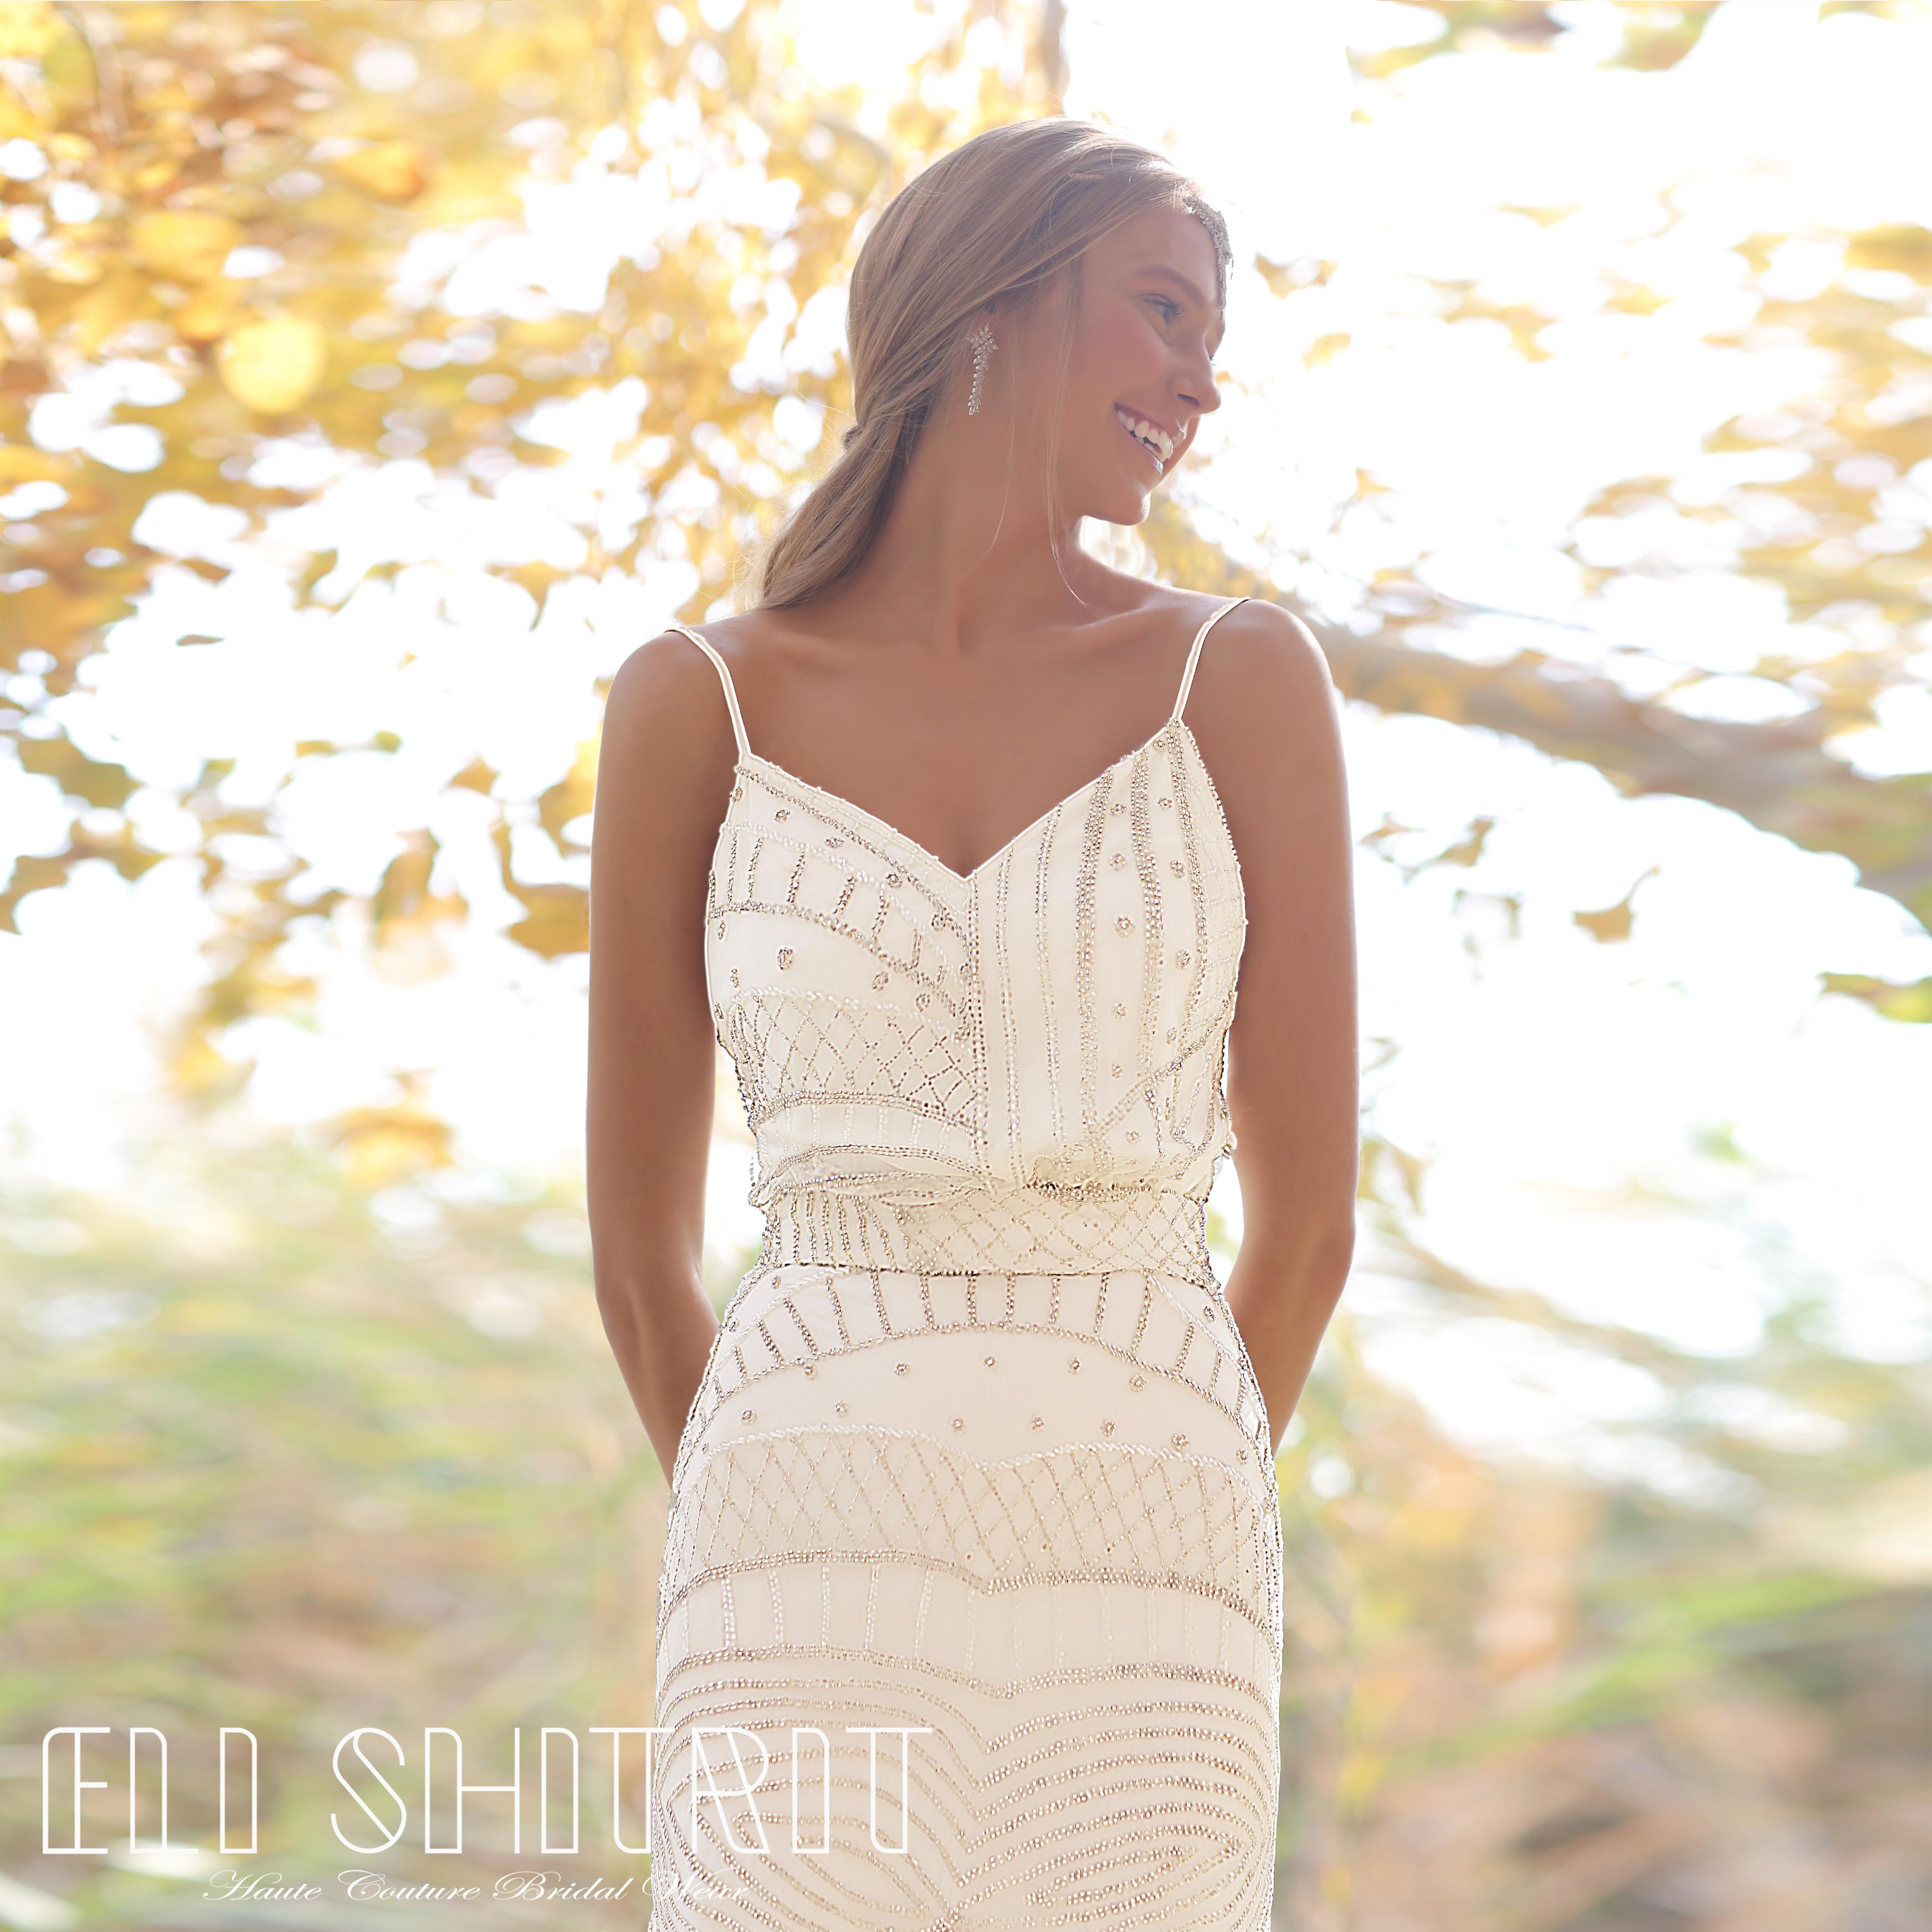 #31 ELI SHIRIT New Collection 2016 אלי שטרית קולקציית